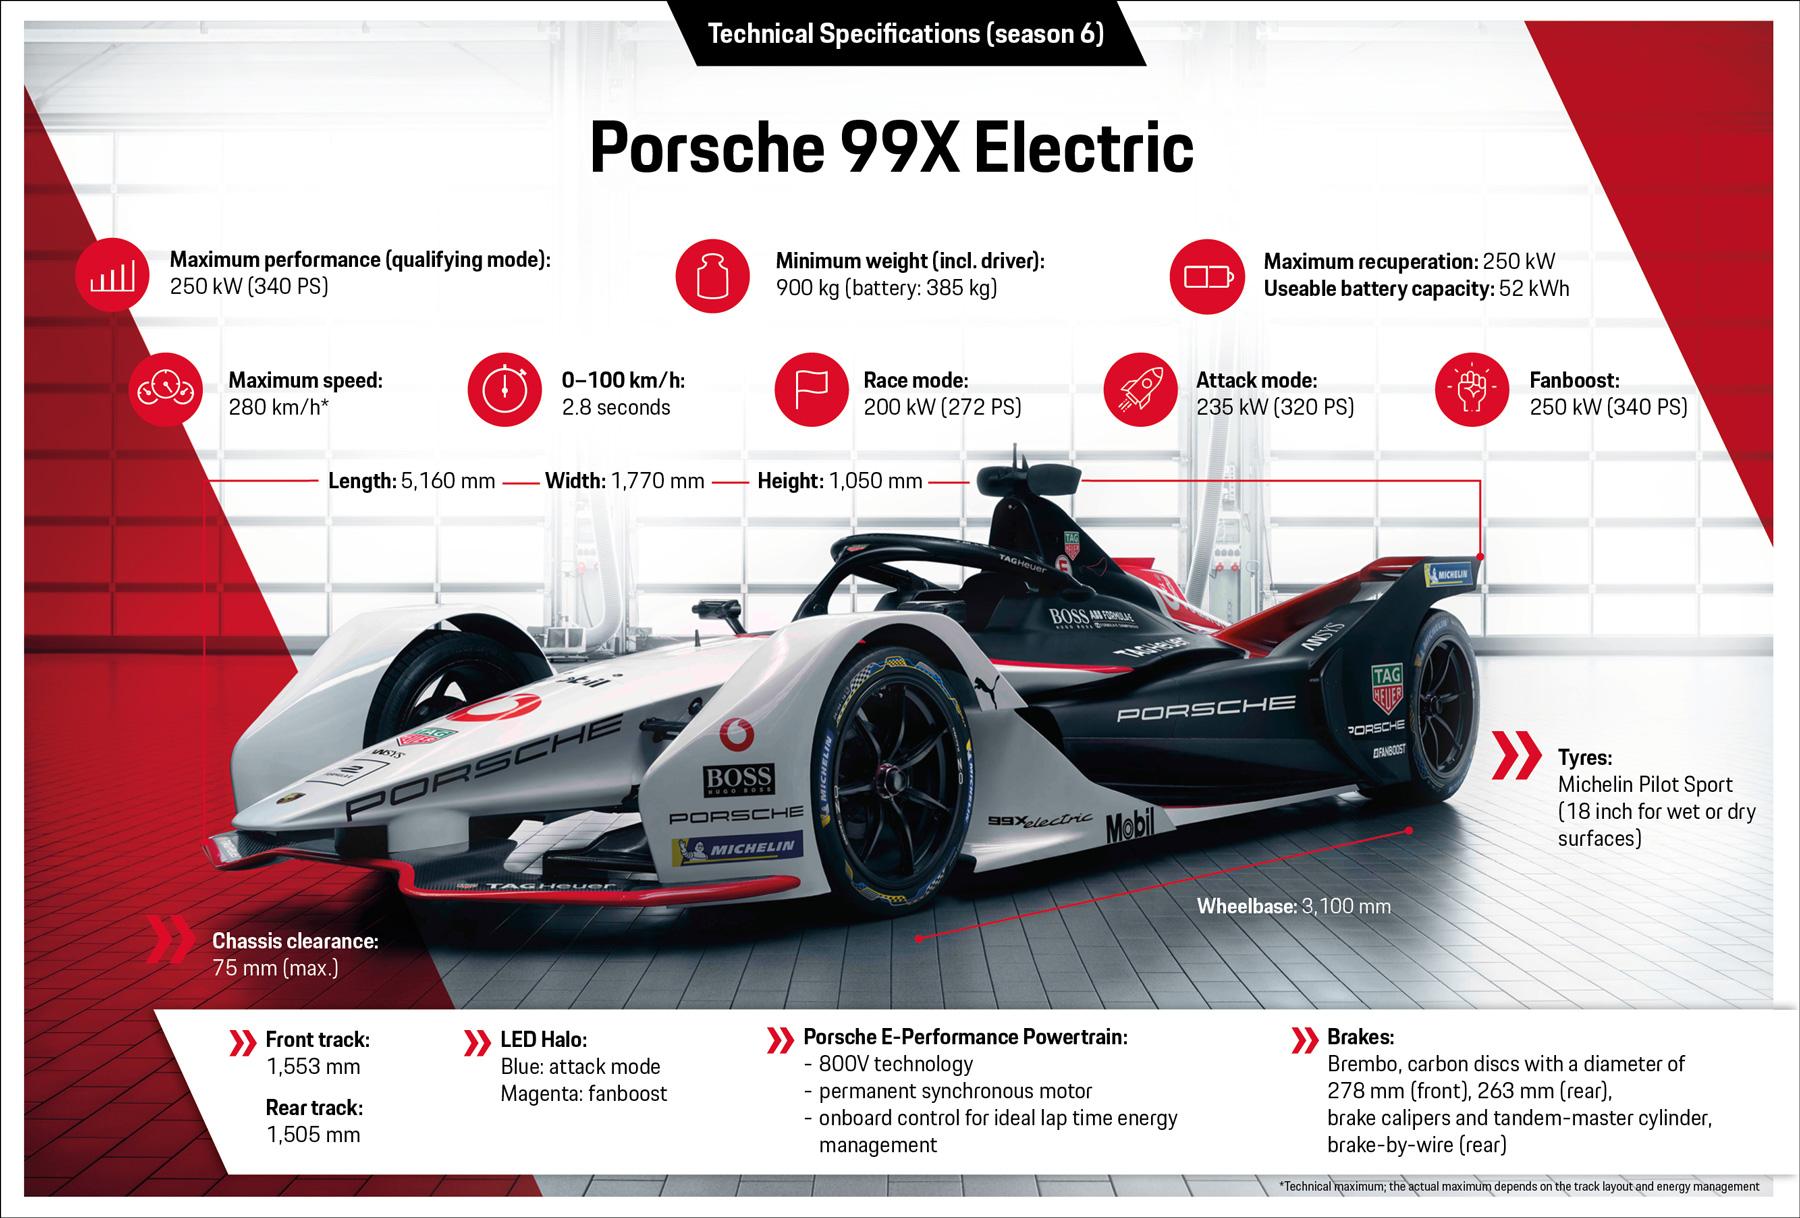 Porsche 99X Electric specs